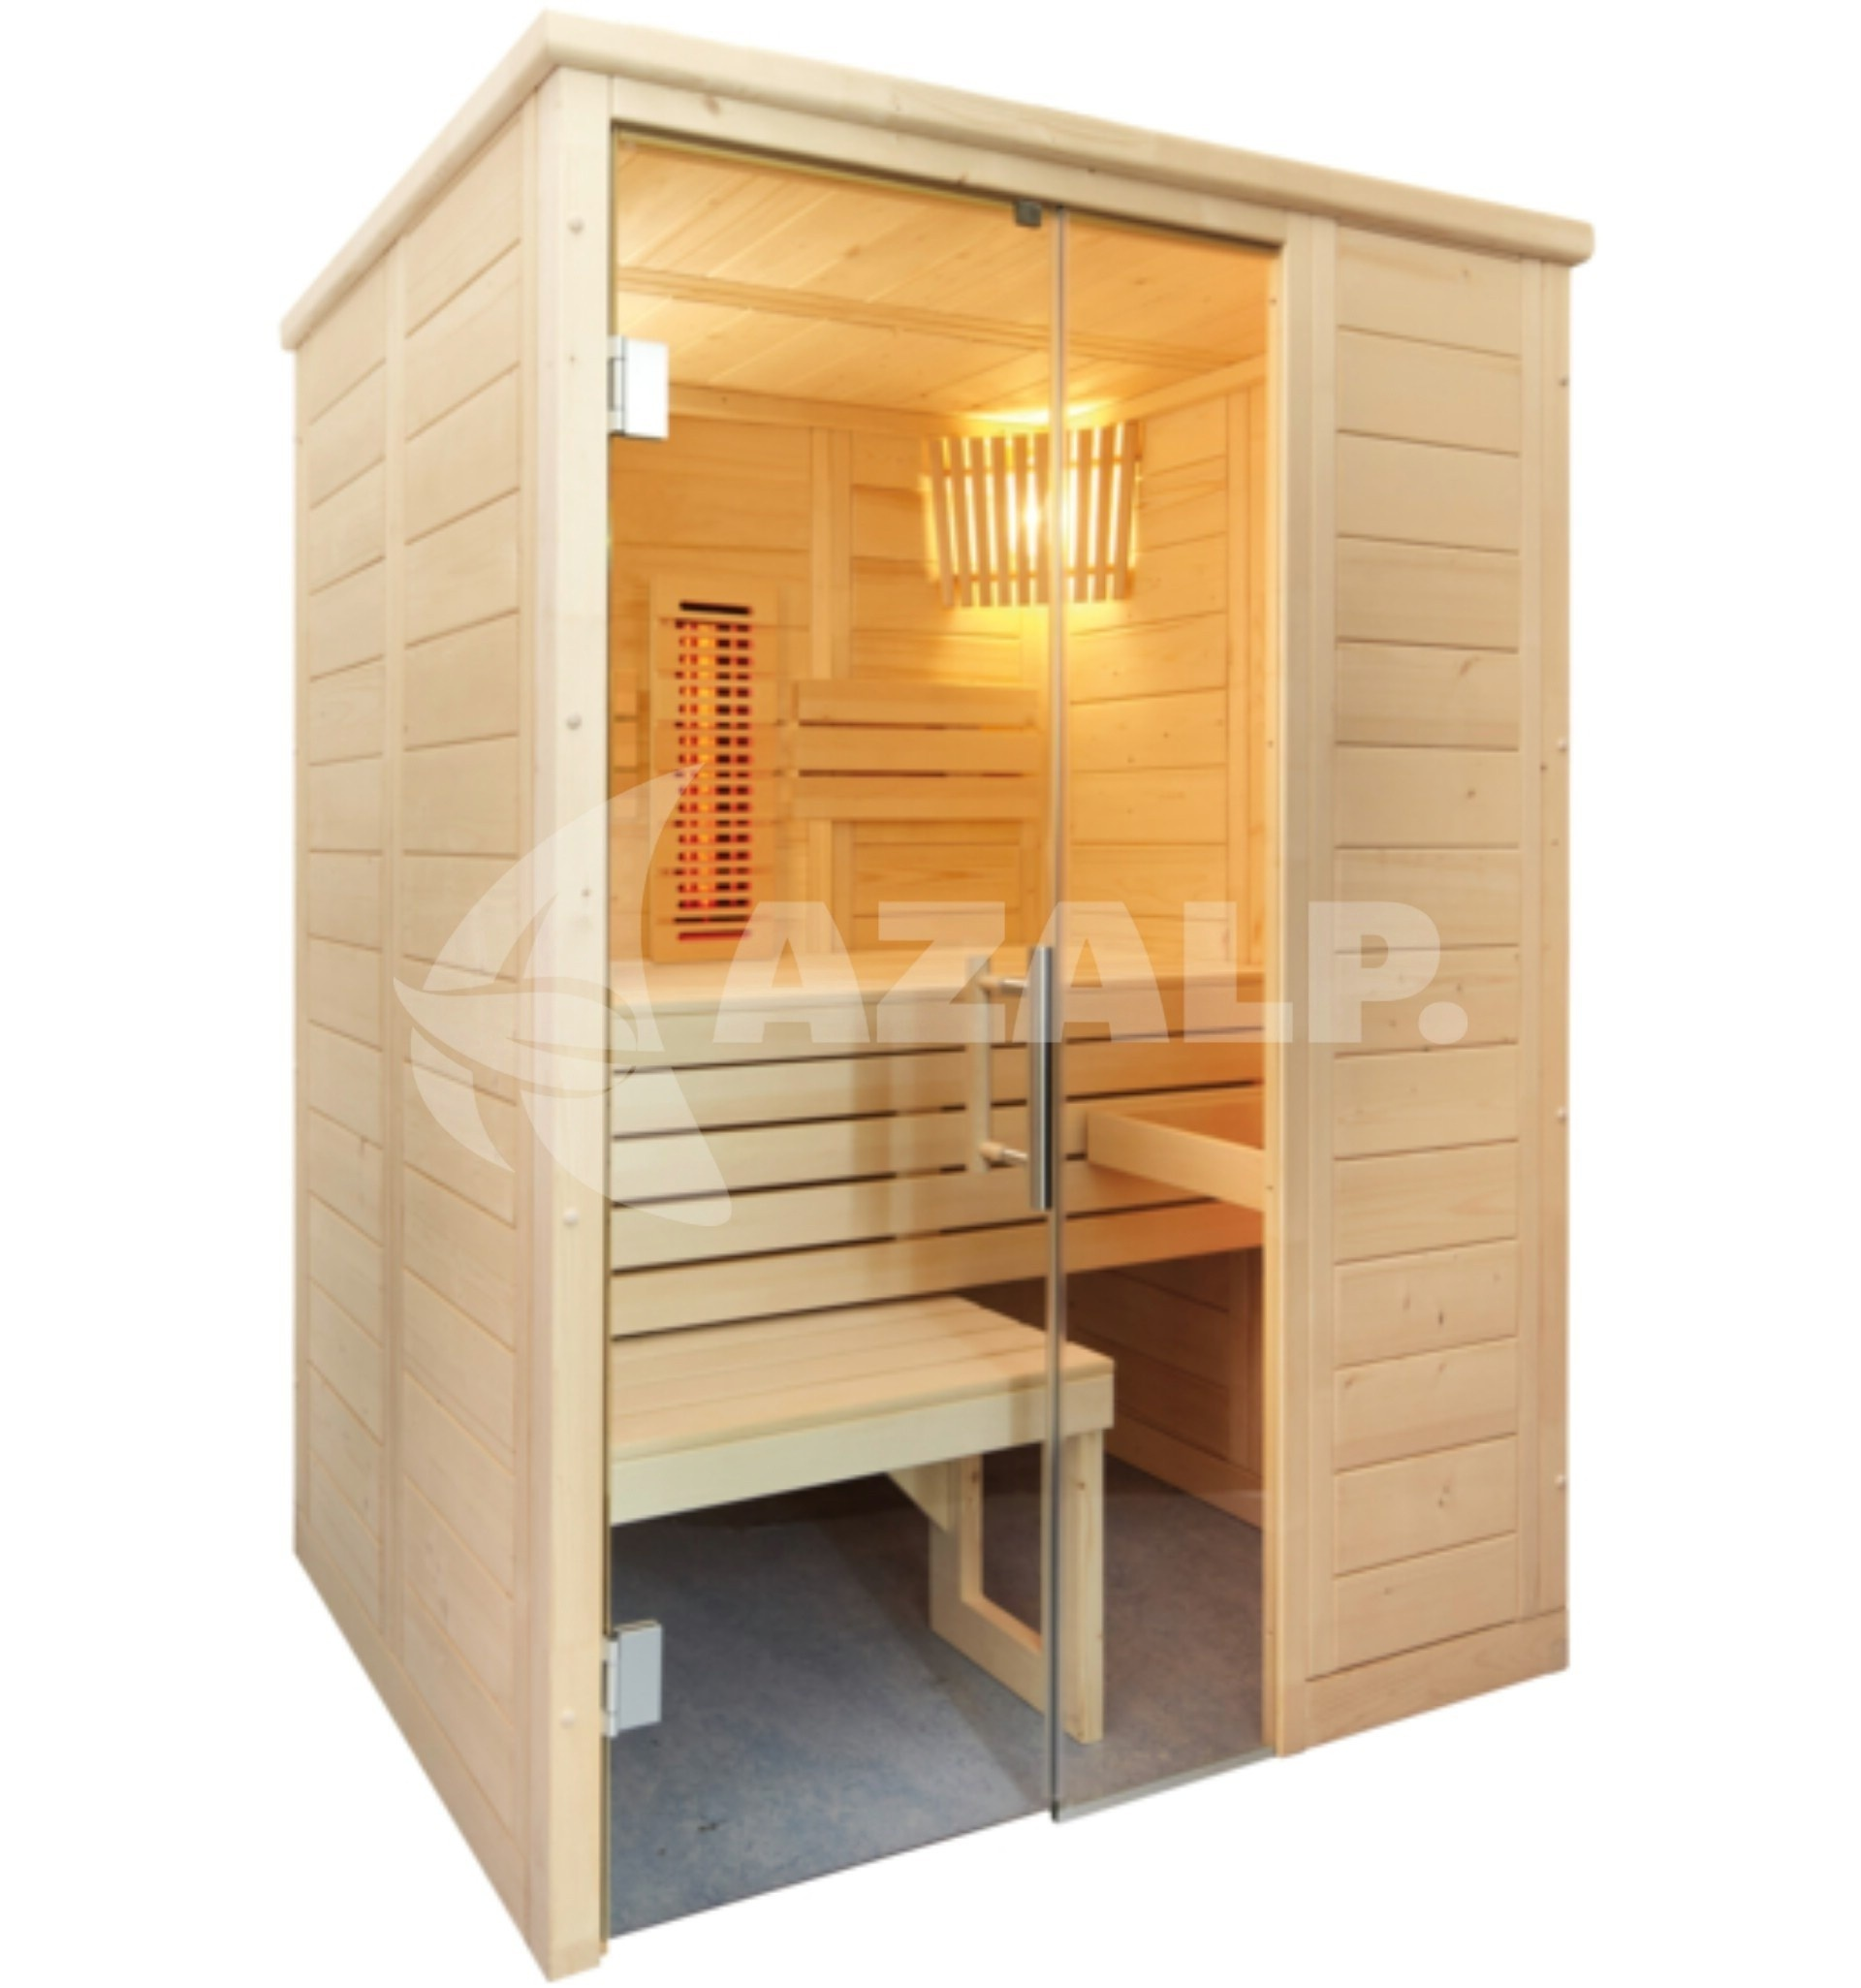 domo 110010016 alaska mini infra kopen bij. Black Bedroom Furniture Sets. Home Design Ideas